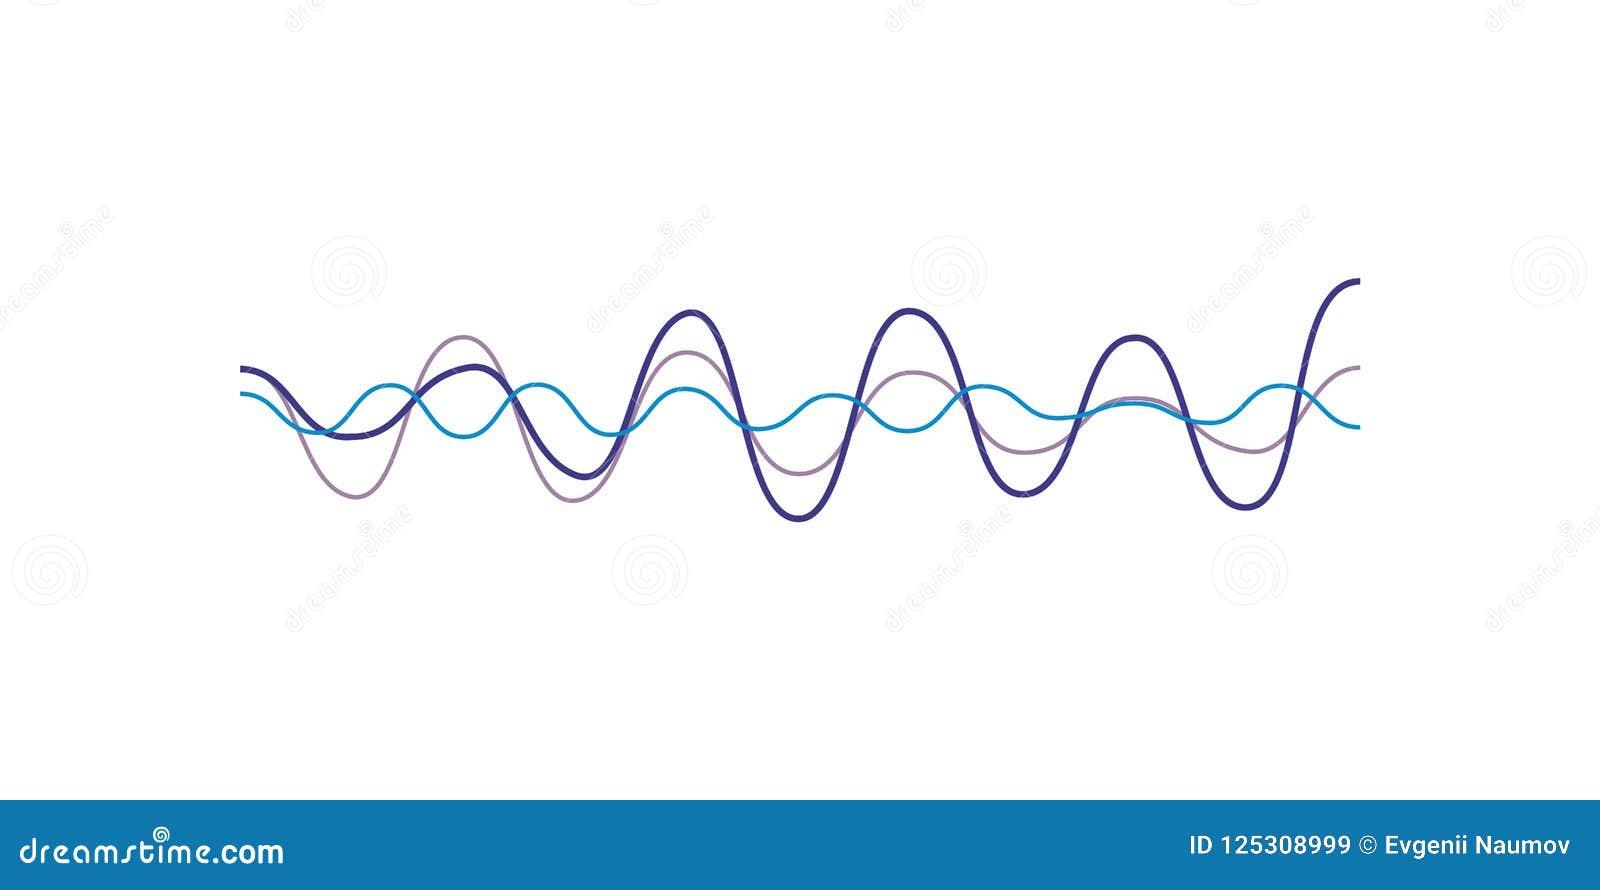 Blue sound wave, audio digital equalizer technology, musical pulse vector Illustration on a white background